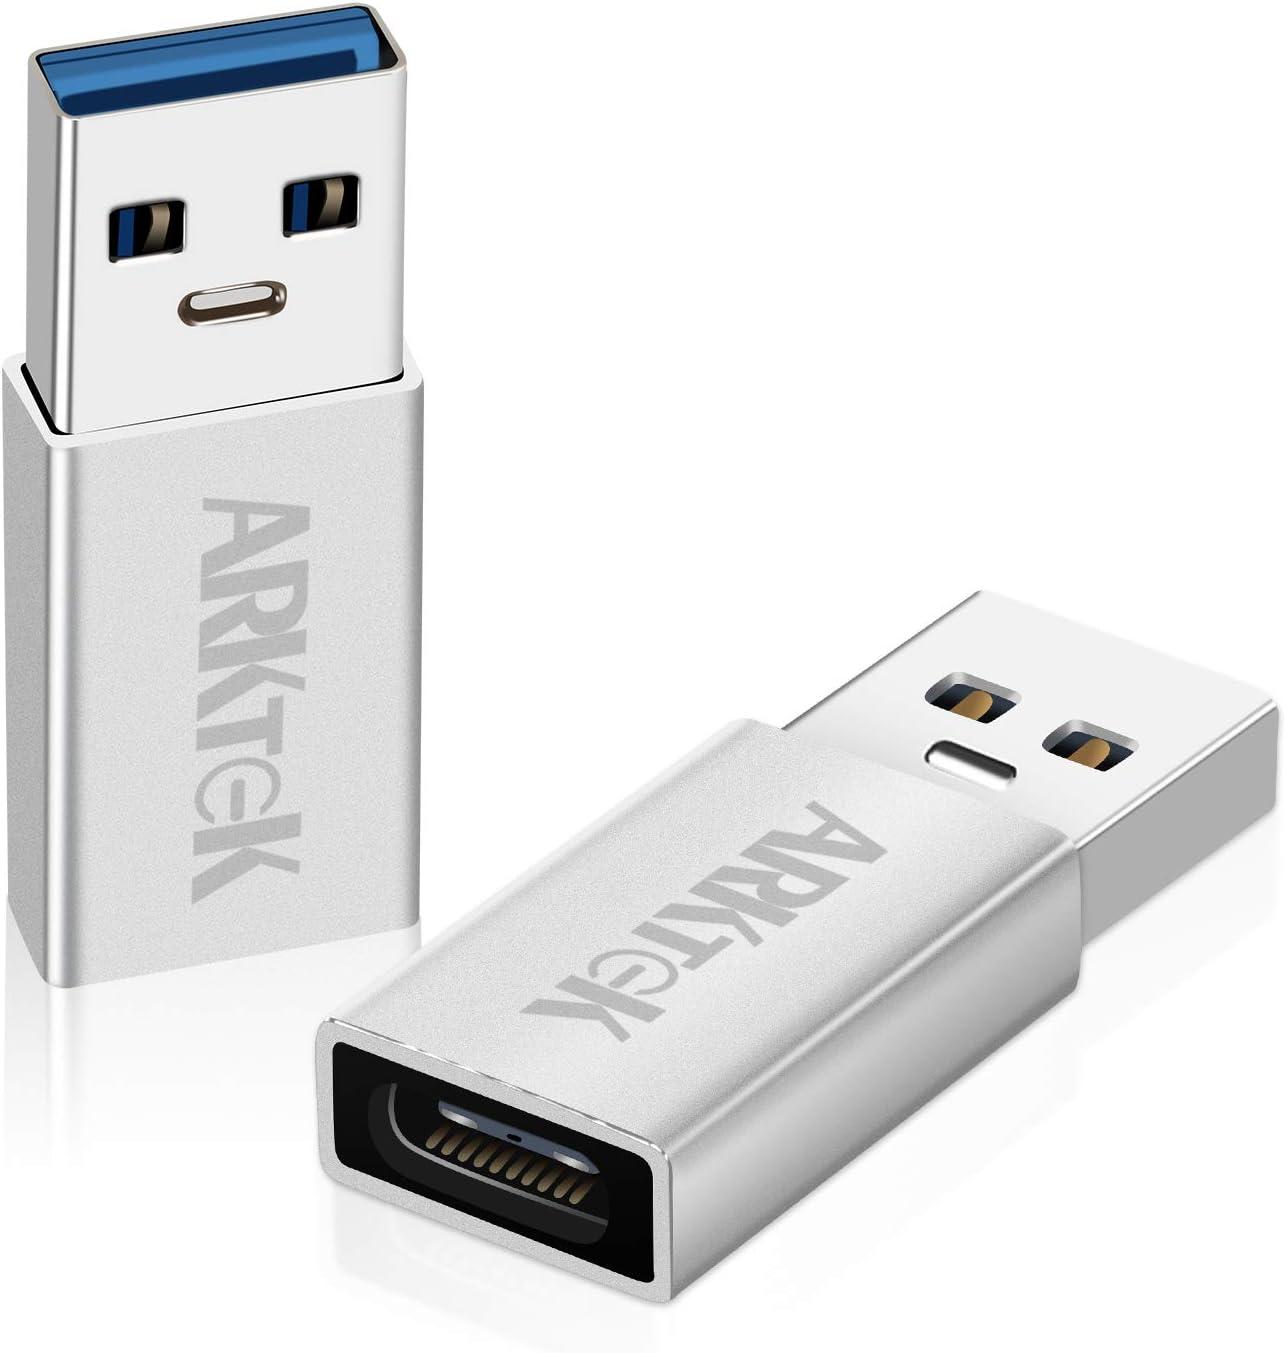 USB 3.0 Type A Socket to USB 3.1 Type C Male Plug Adapter HI